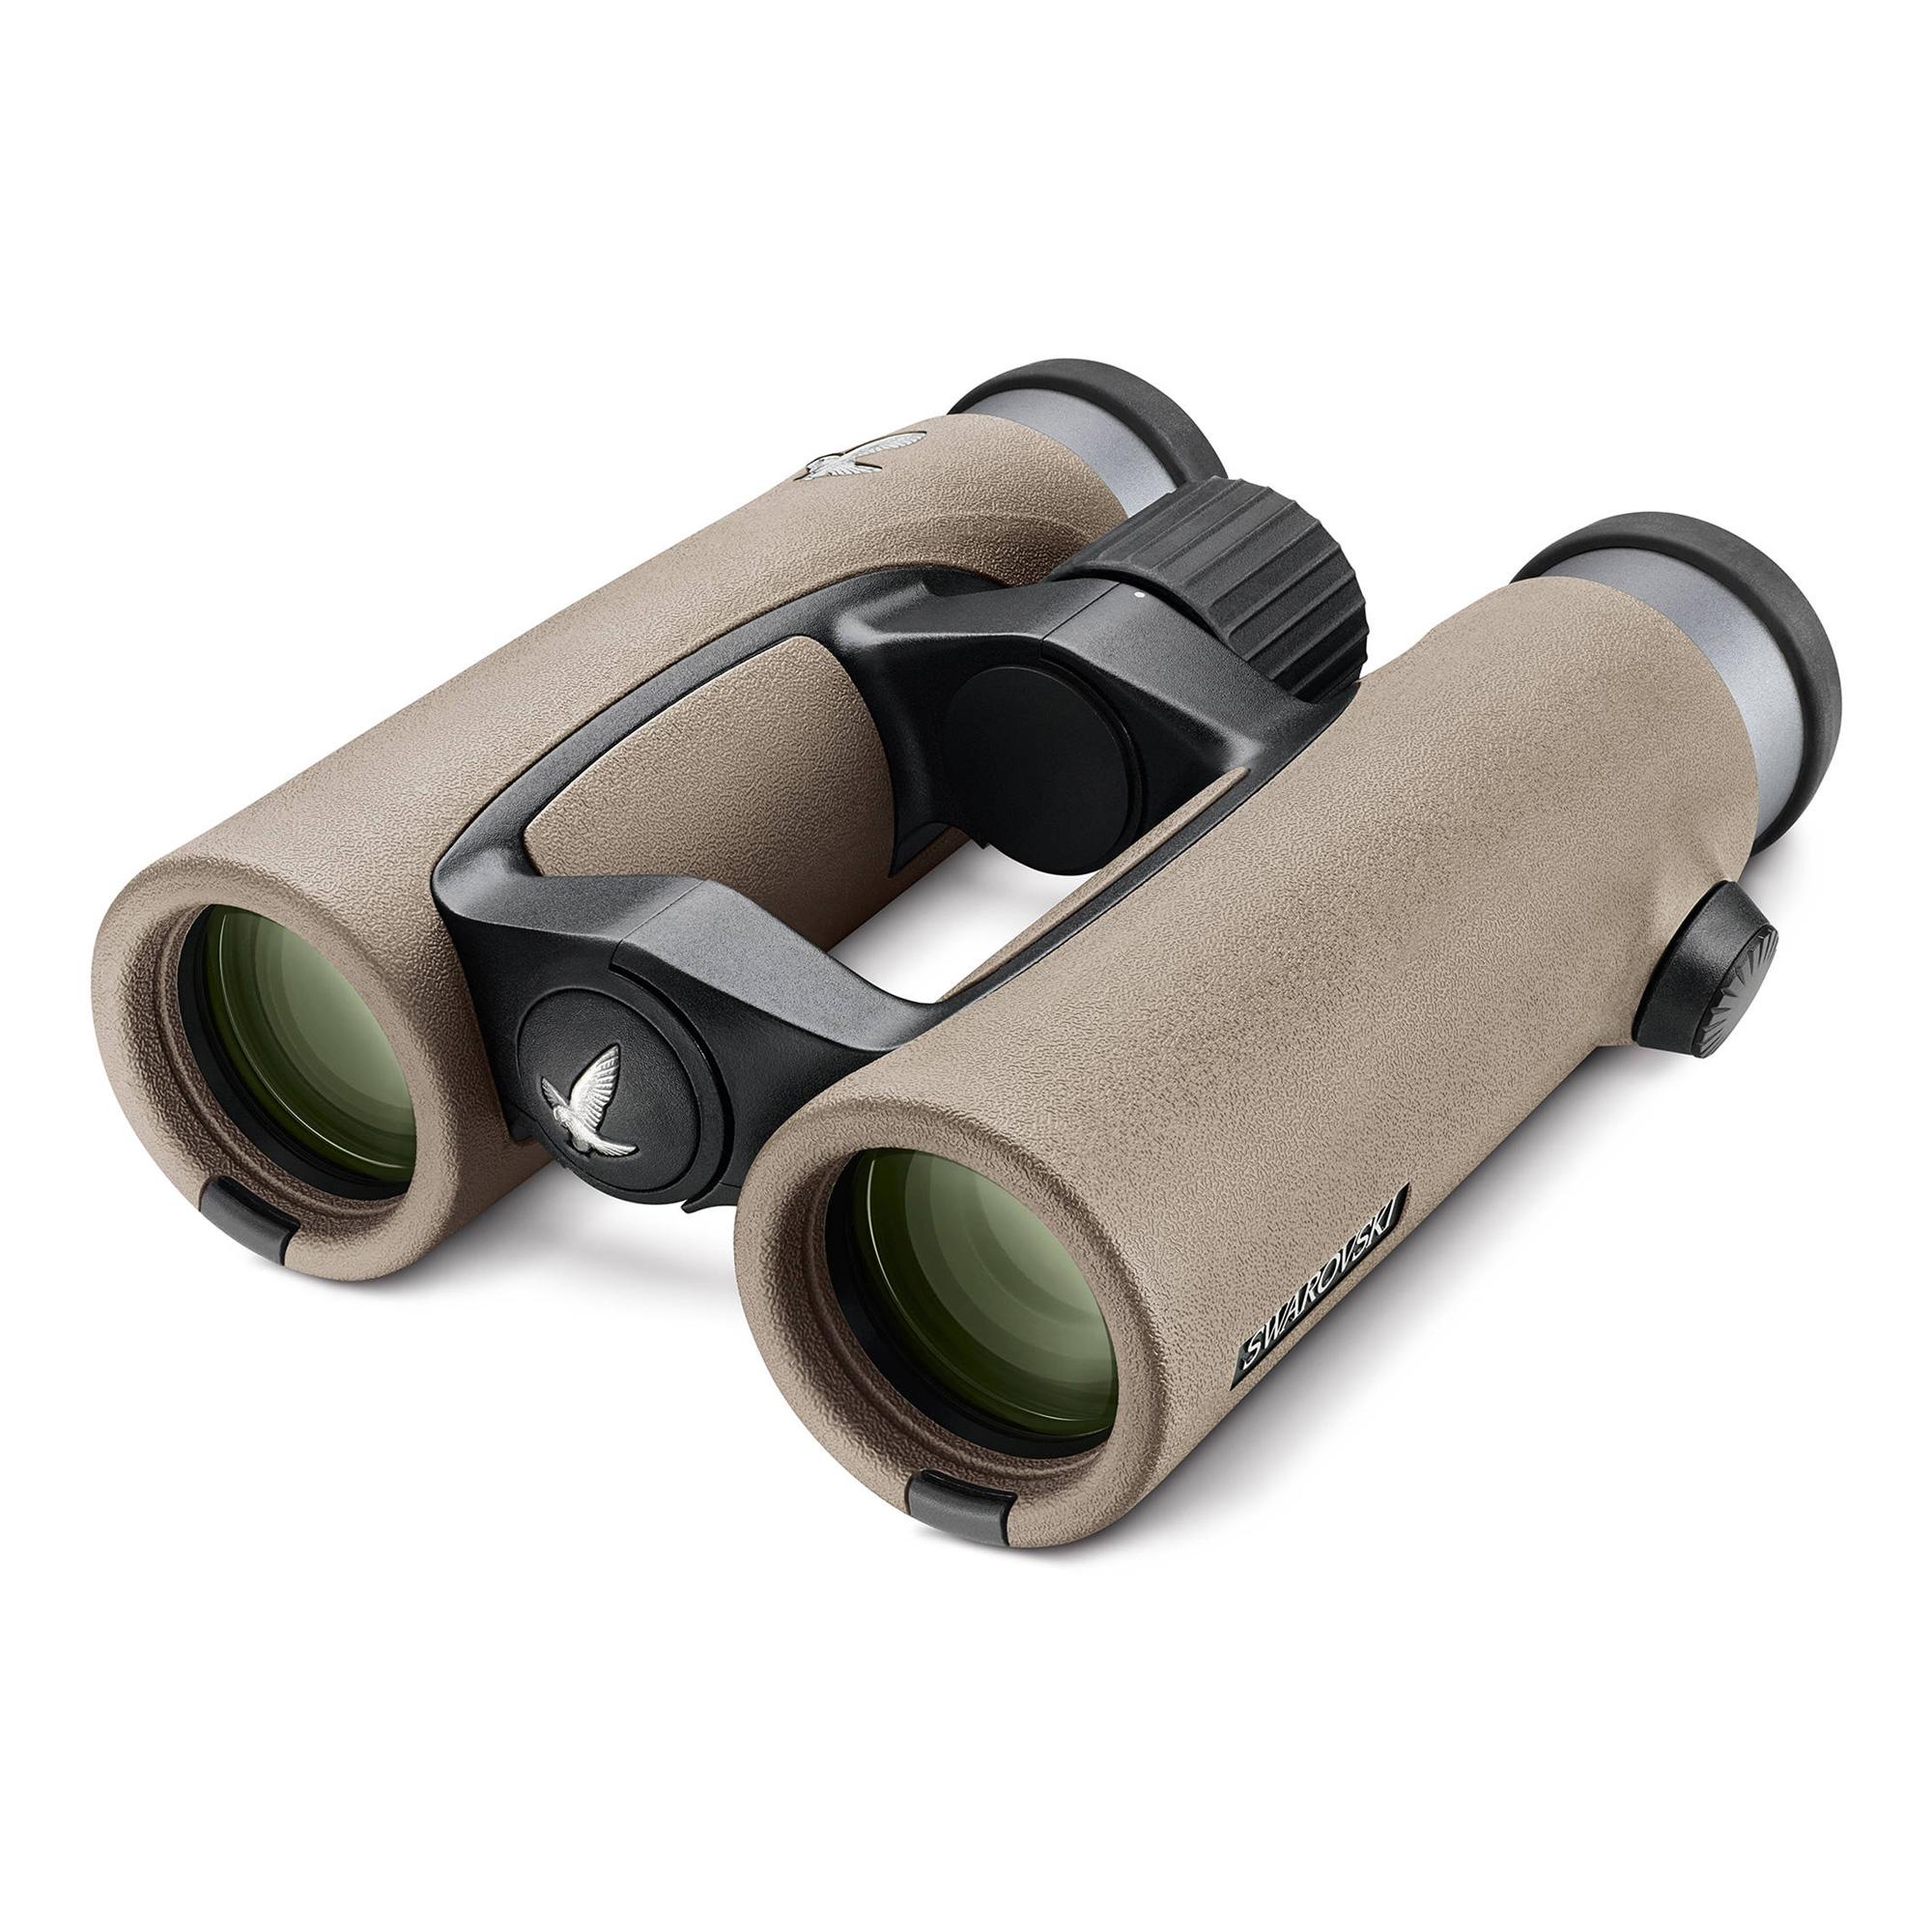 Image of Swarovski 8x32 EL32 Binocular with FieldPro Package (Sand Brown)